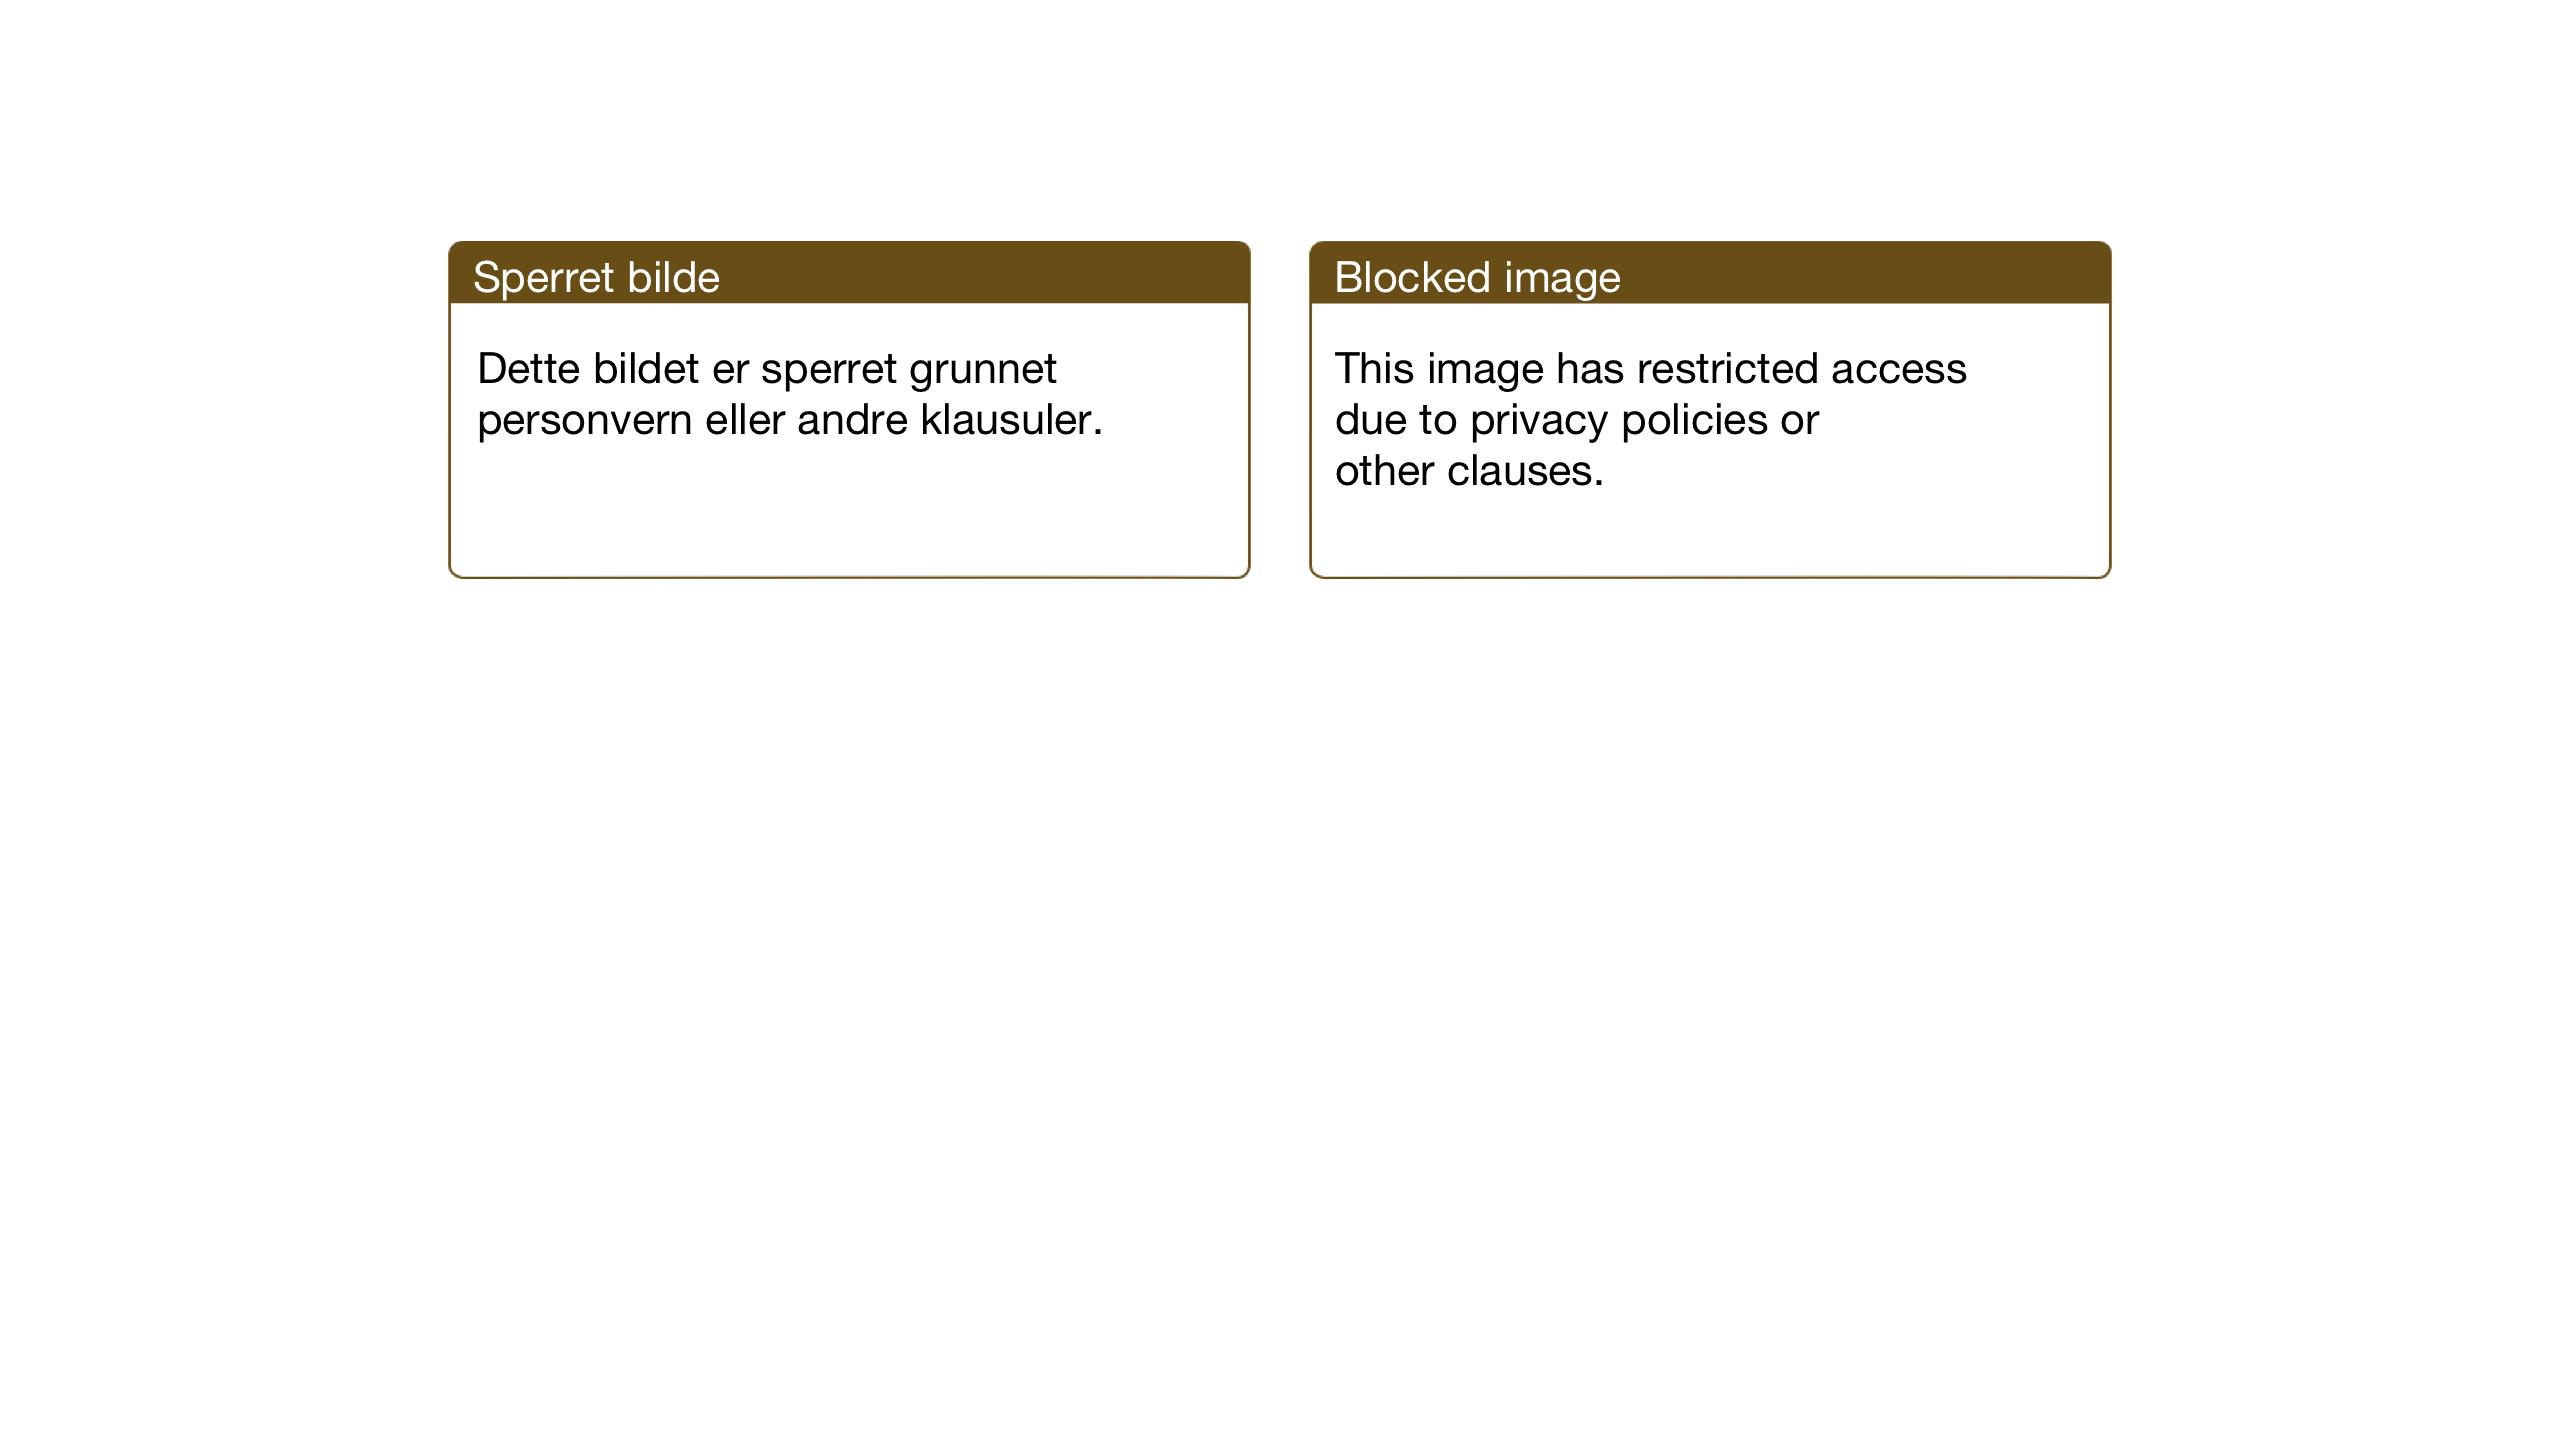 SAT, Ministerialprotokoller, klokkerbøker og fødselsregistre - Sør-Trøndelag, 693/L1124: Parish register (copy) no. 693C05, 1911-1941, p. 87